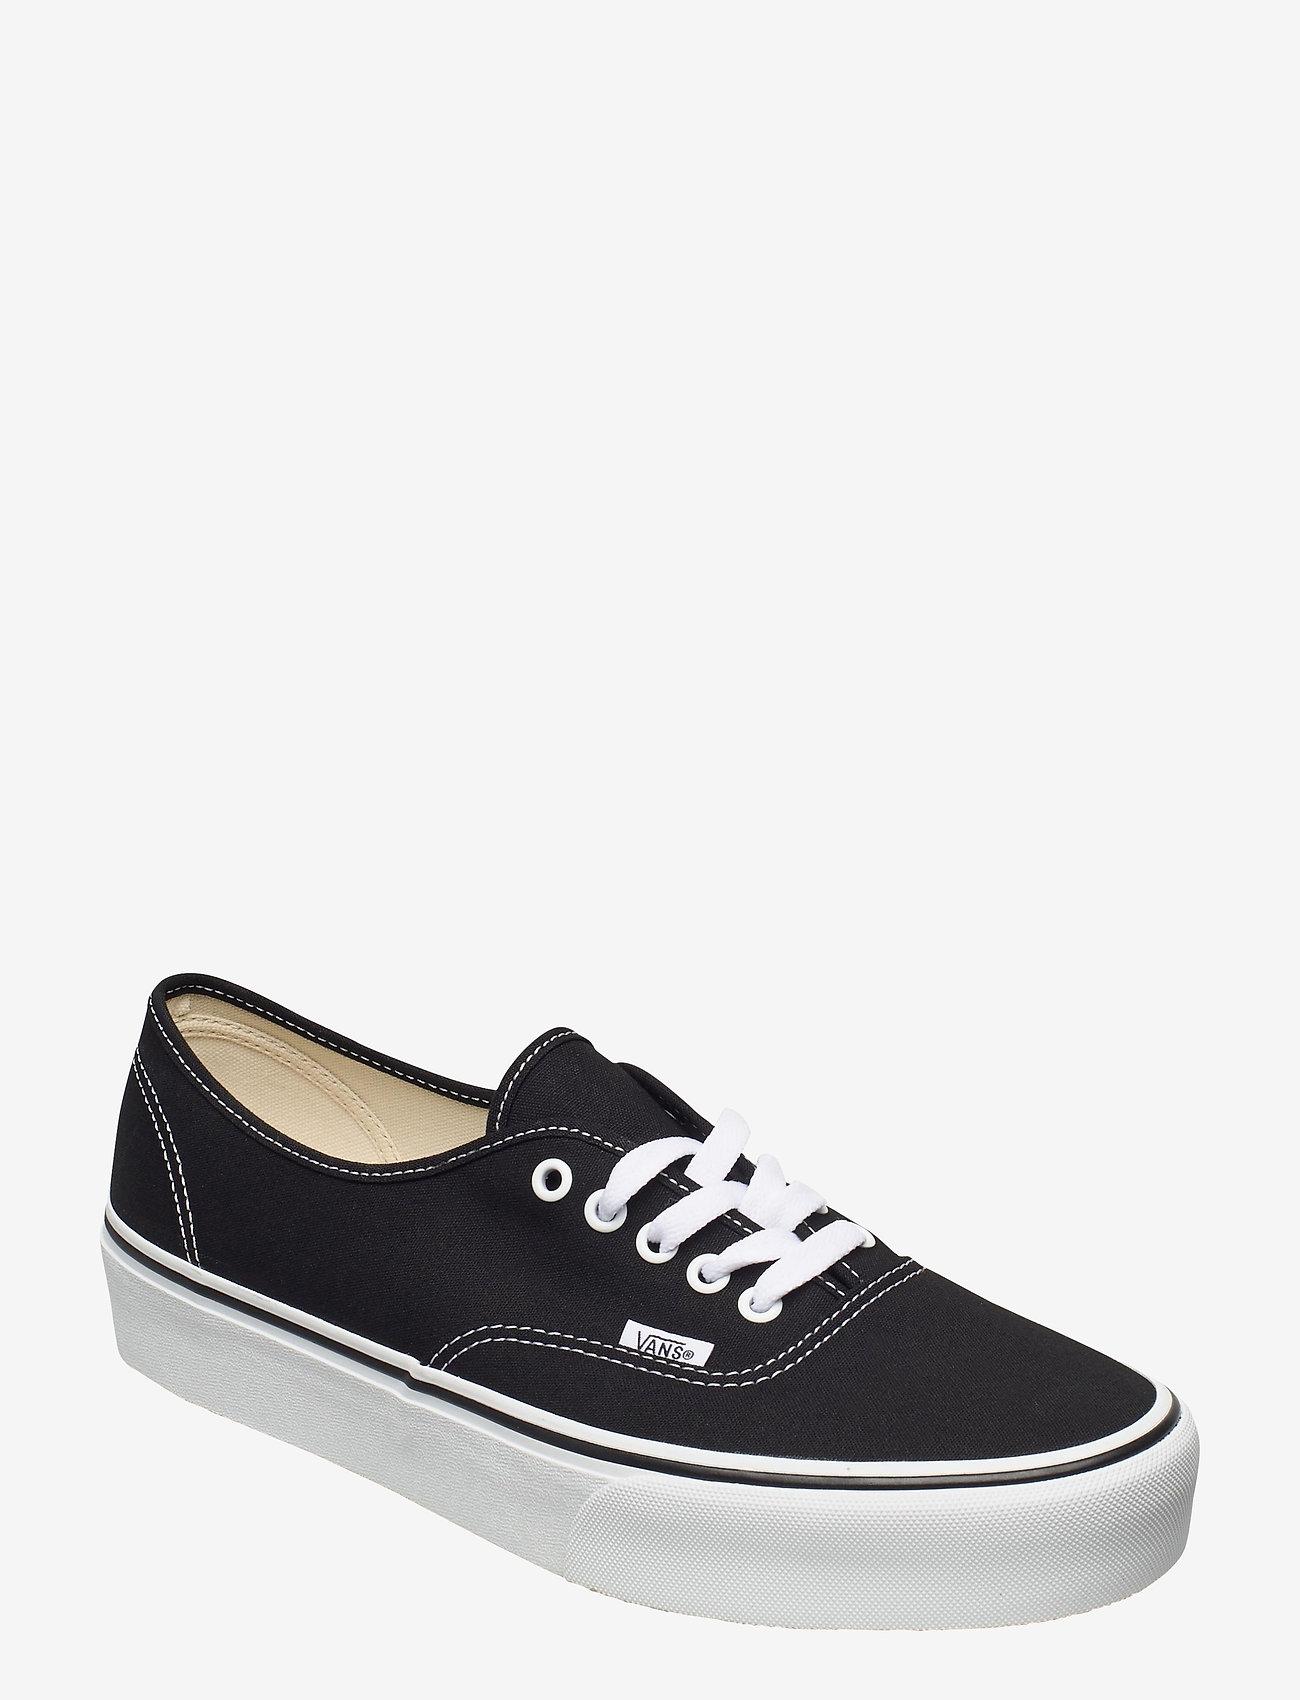 VANS - UA Authentic Platform 2.0 - laag sneakers - black - 0